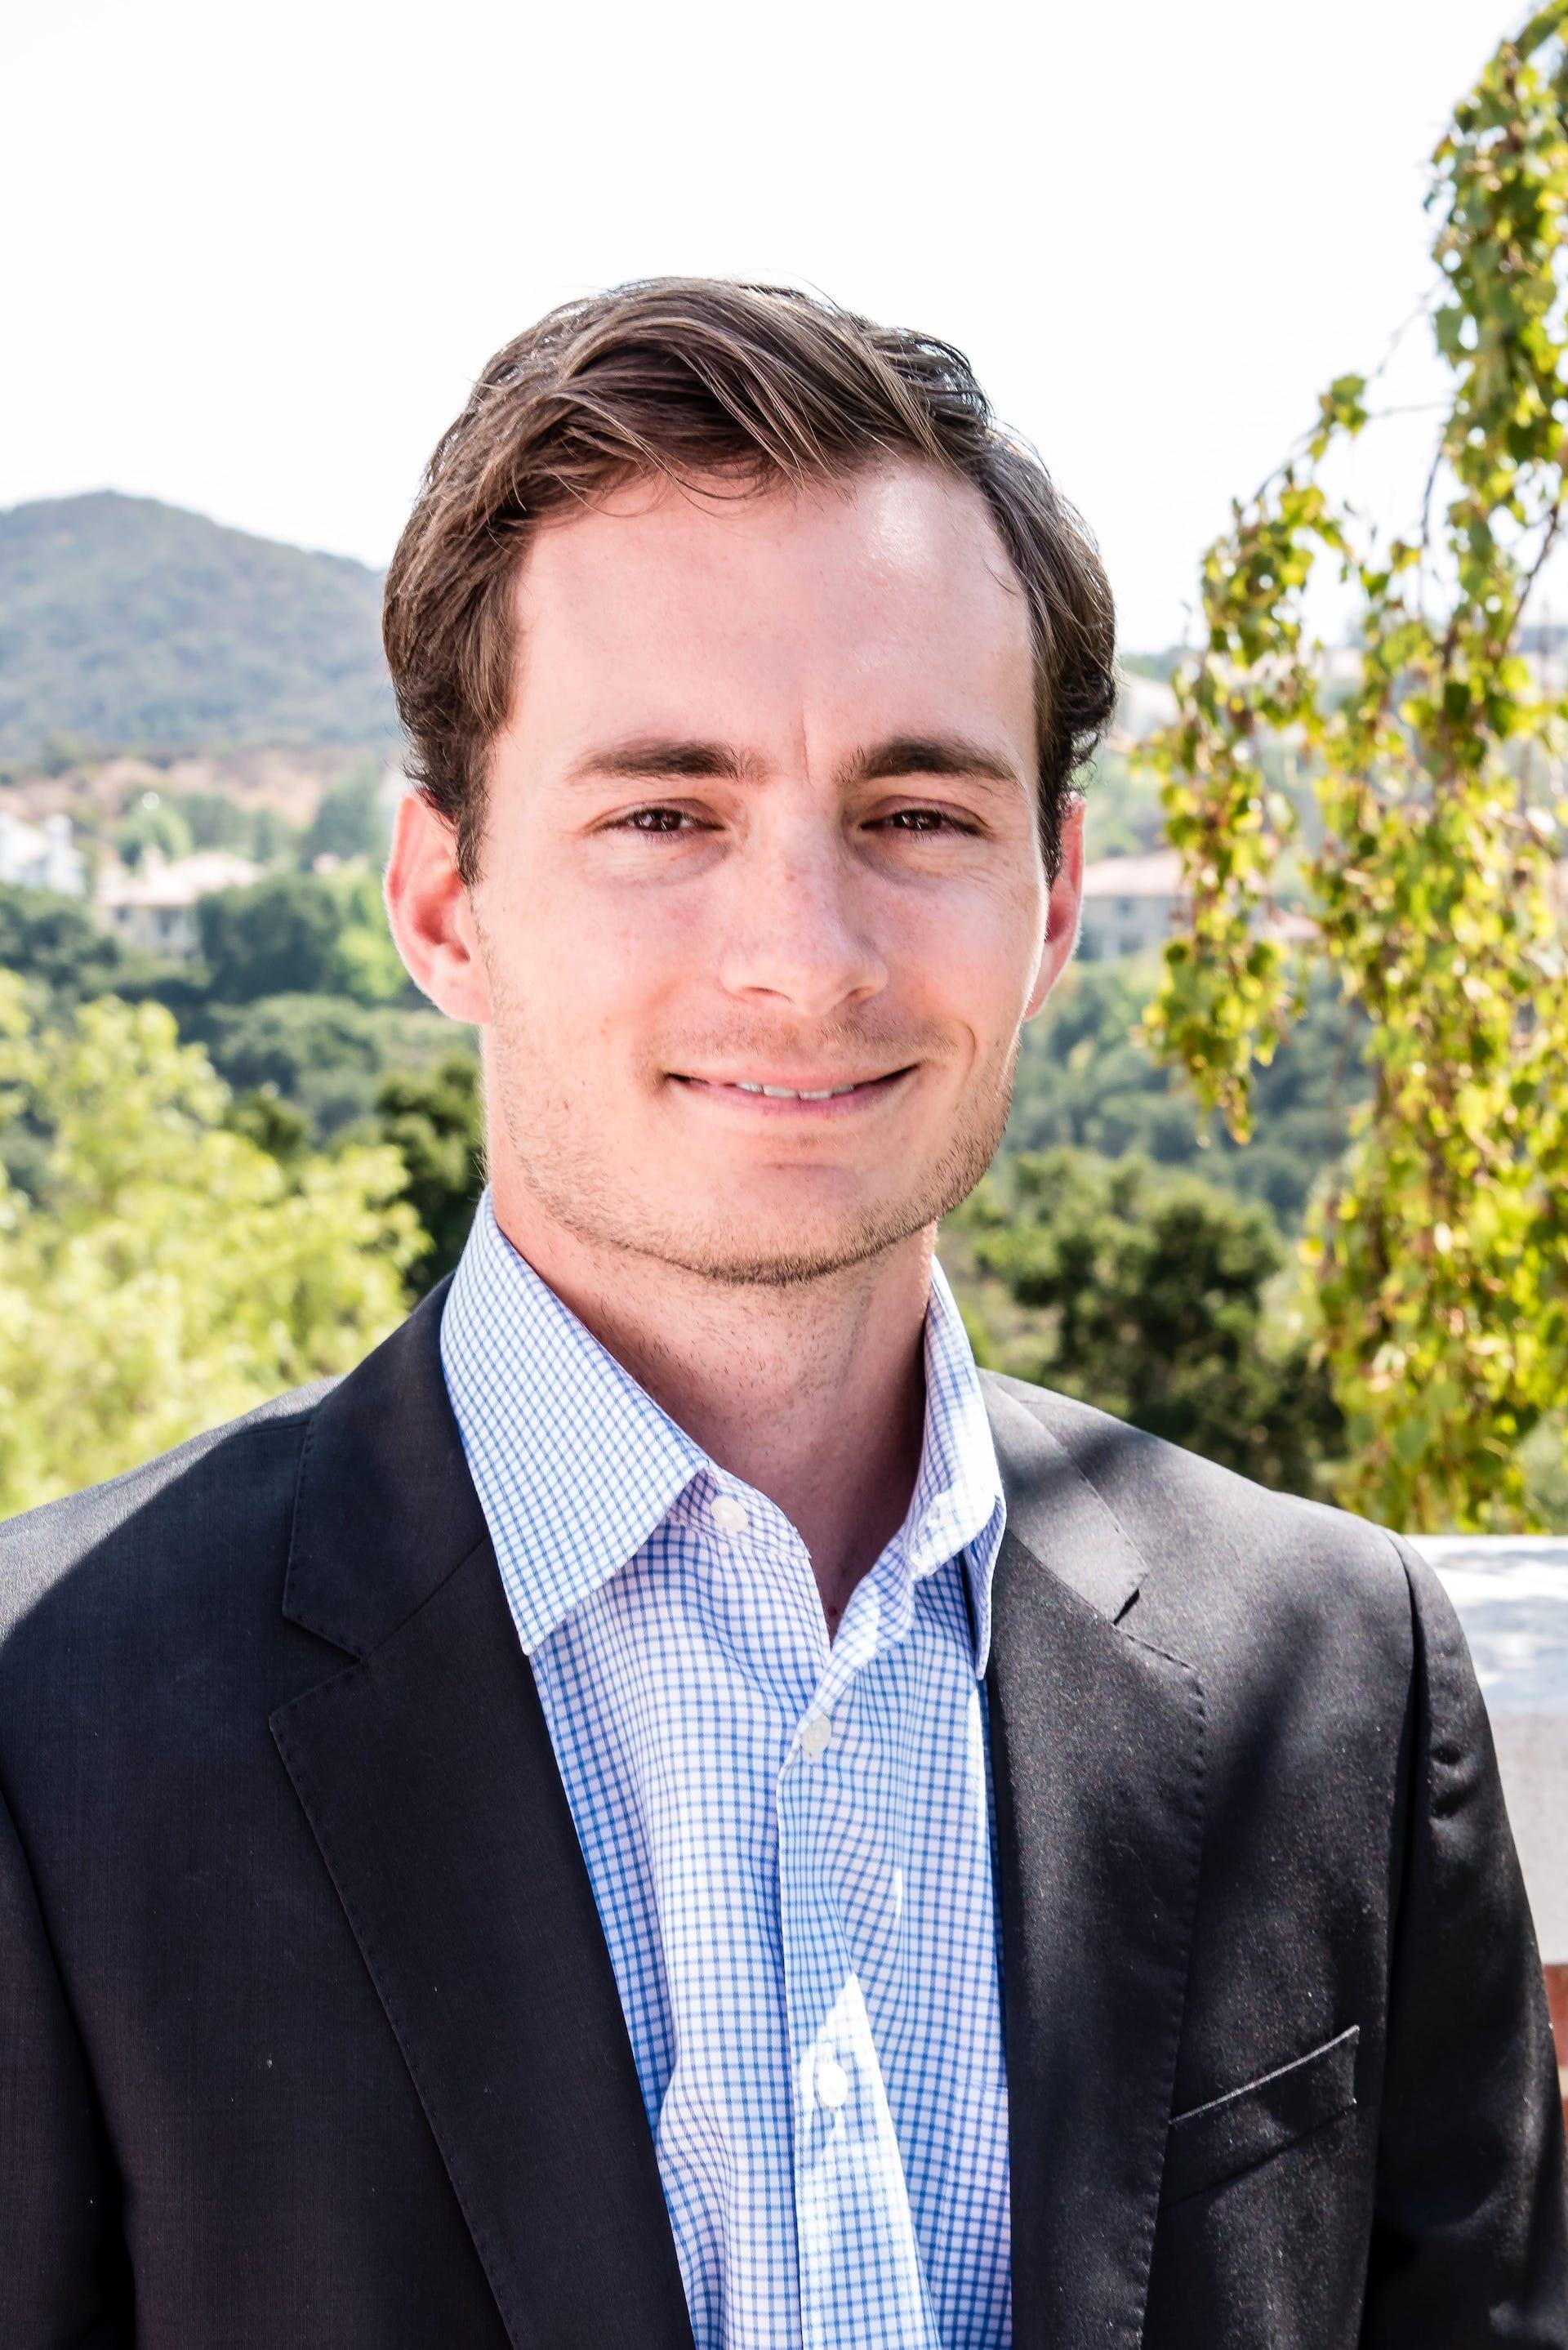 Seth Catanese